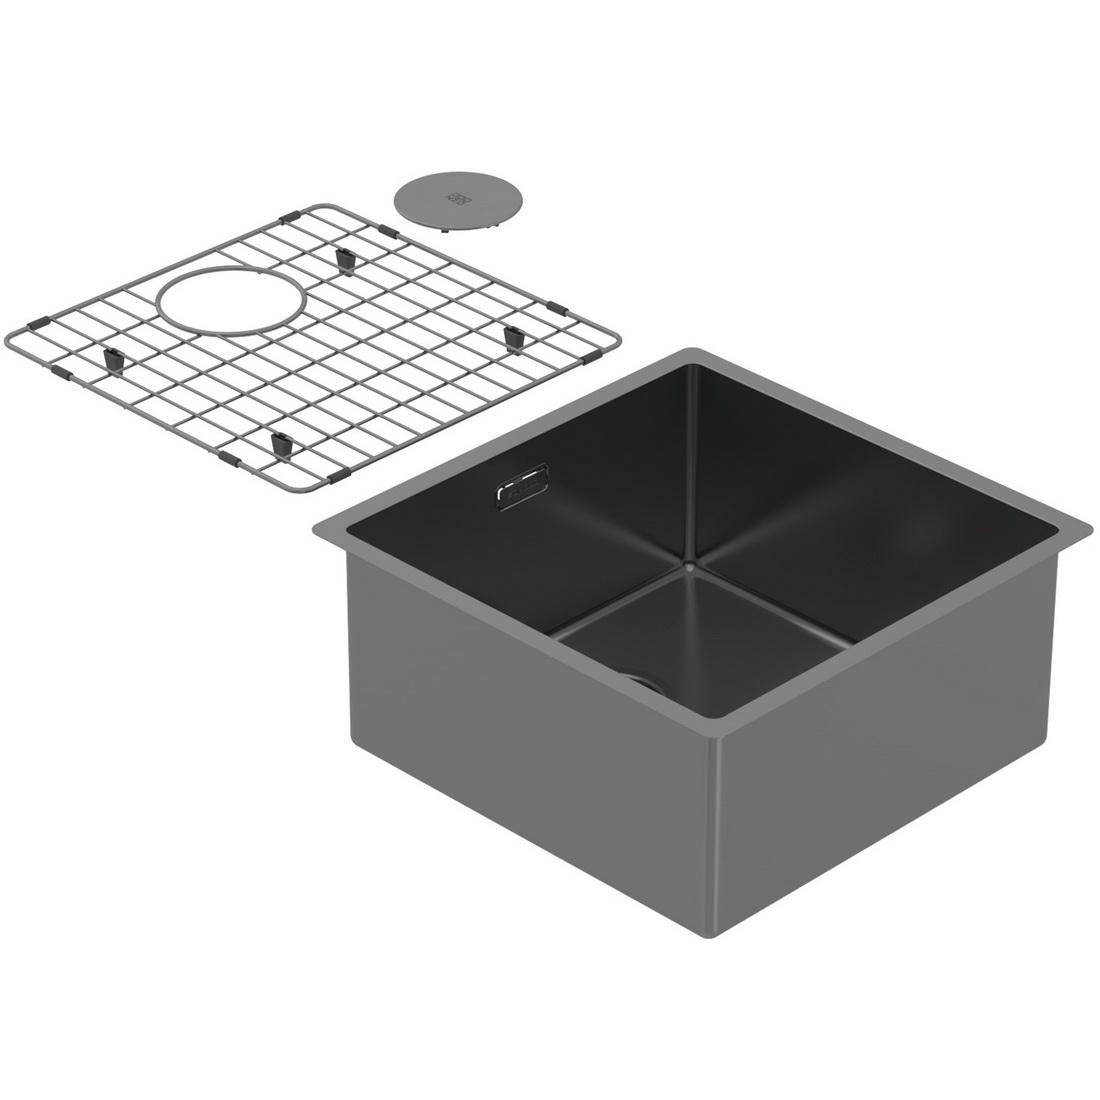 440x440x200mm Single Medium Bowl Undermount Kitchen Sink Cayman Black PearlArc Finish